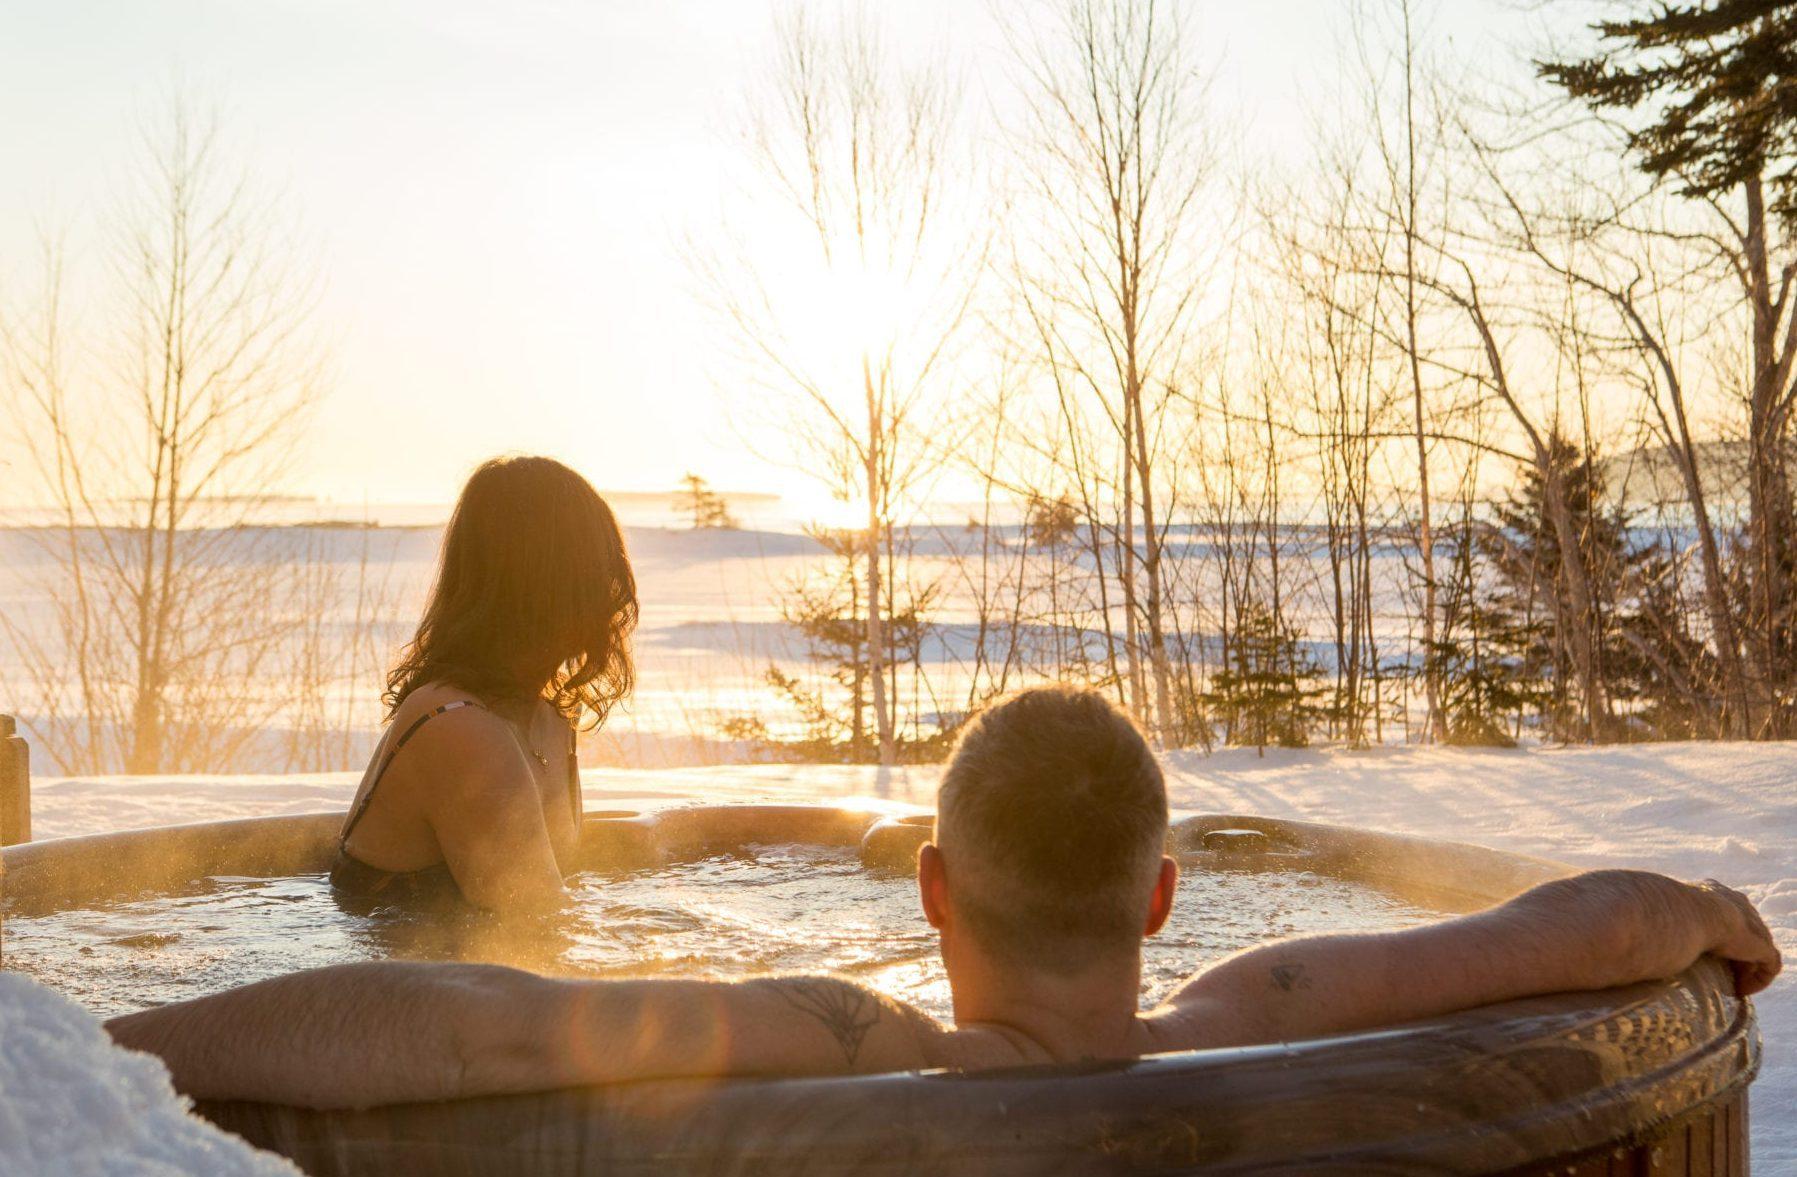 Hot Tub at Blue Chalet